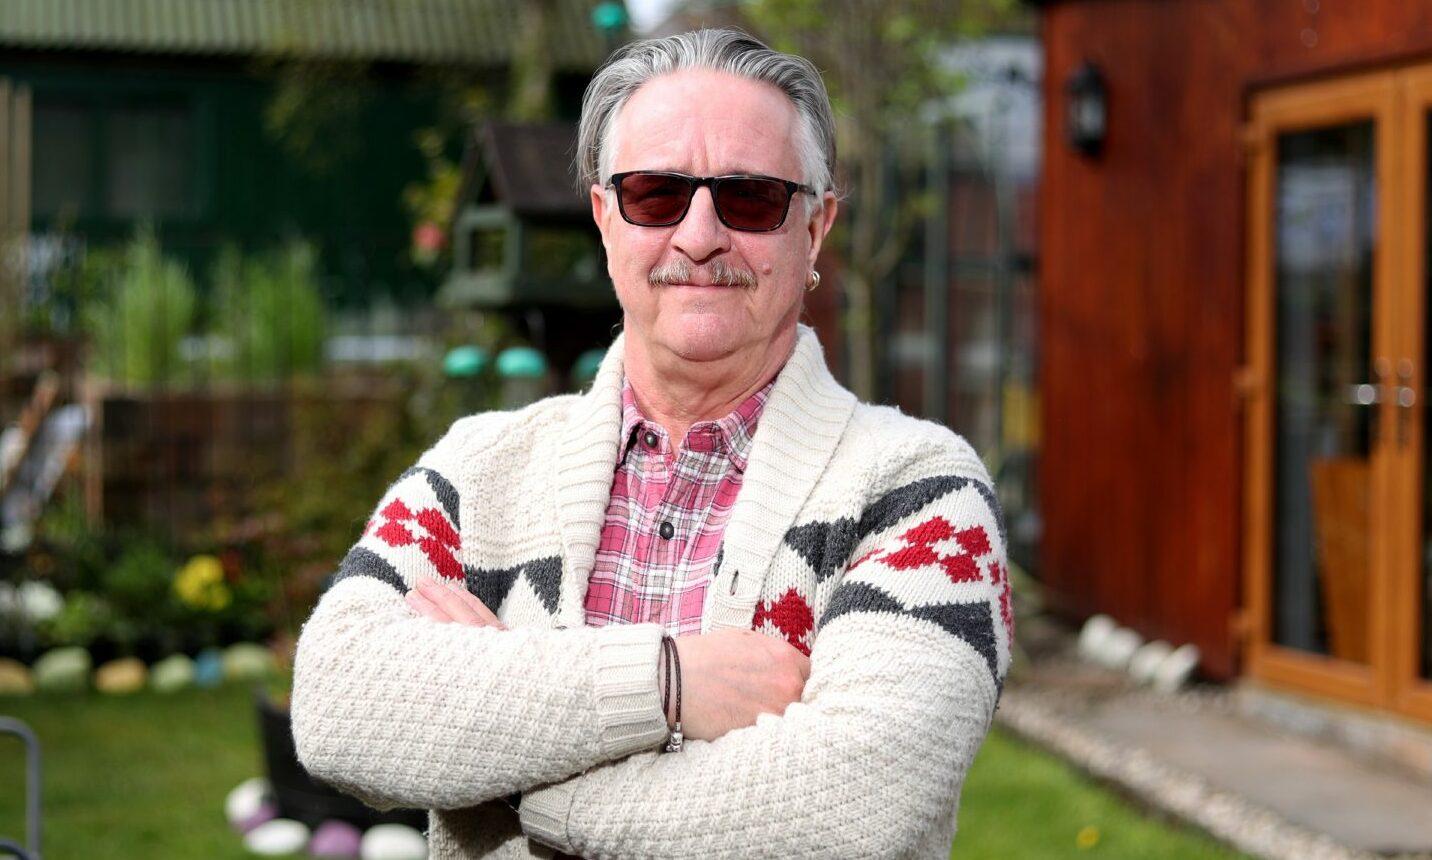 Dermot Craig, deputy chairman of Aberdeen ADP. Picture by Scott Baxter.